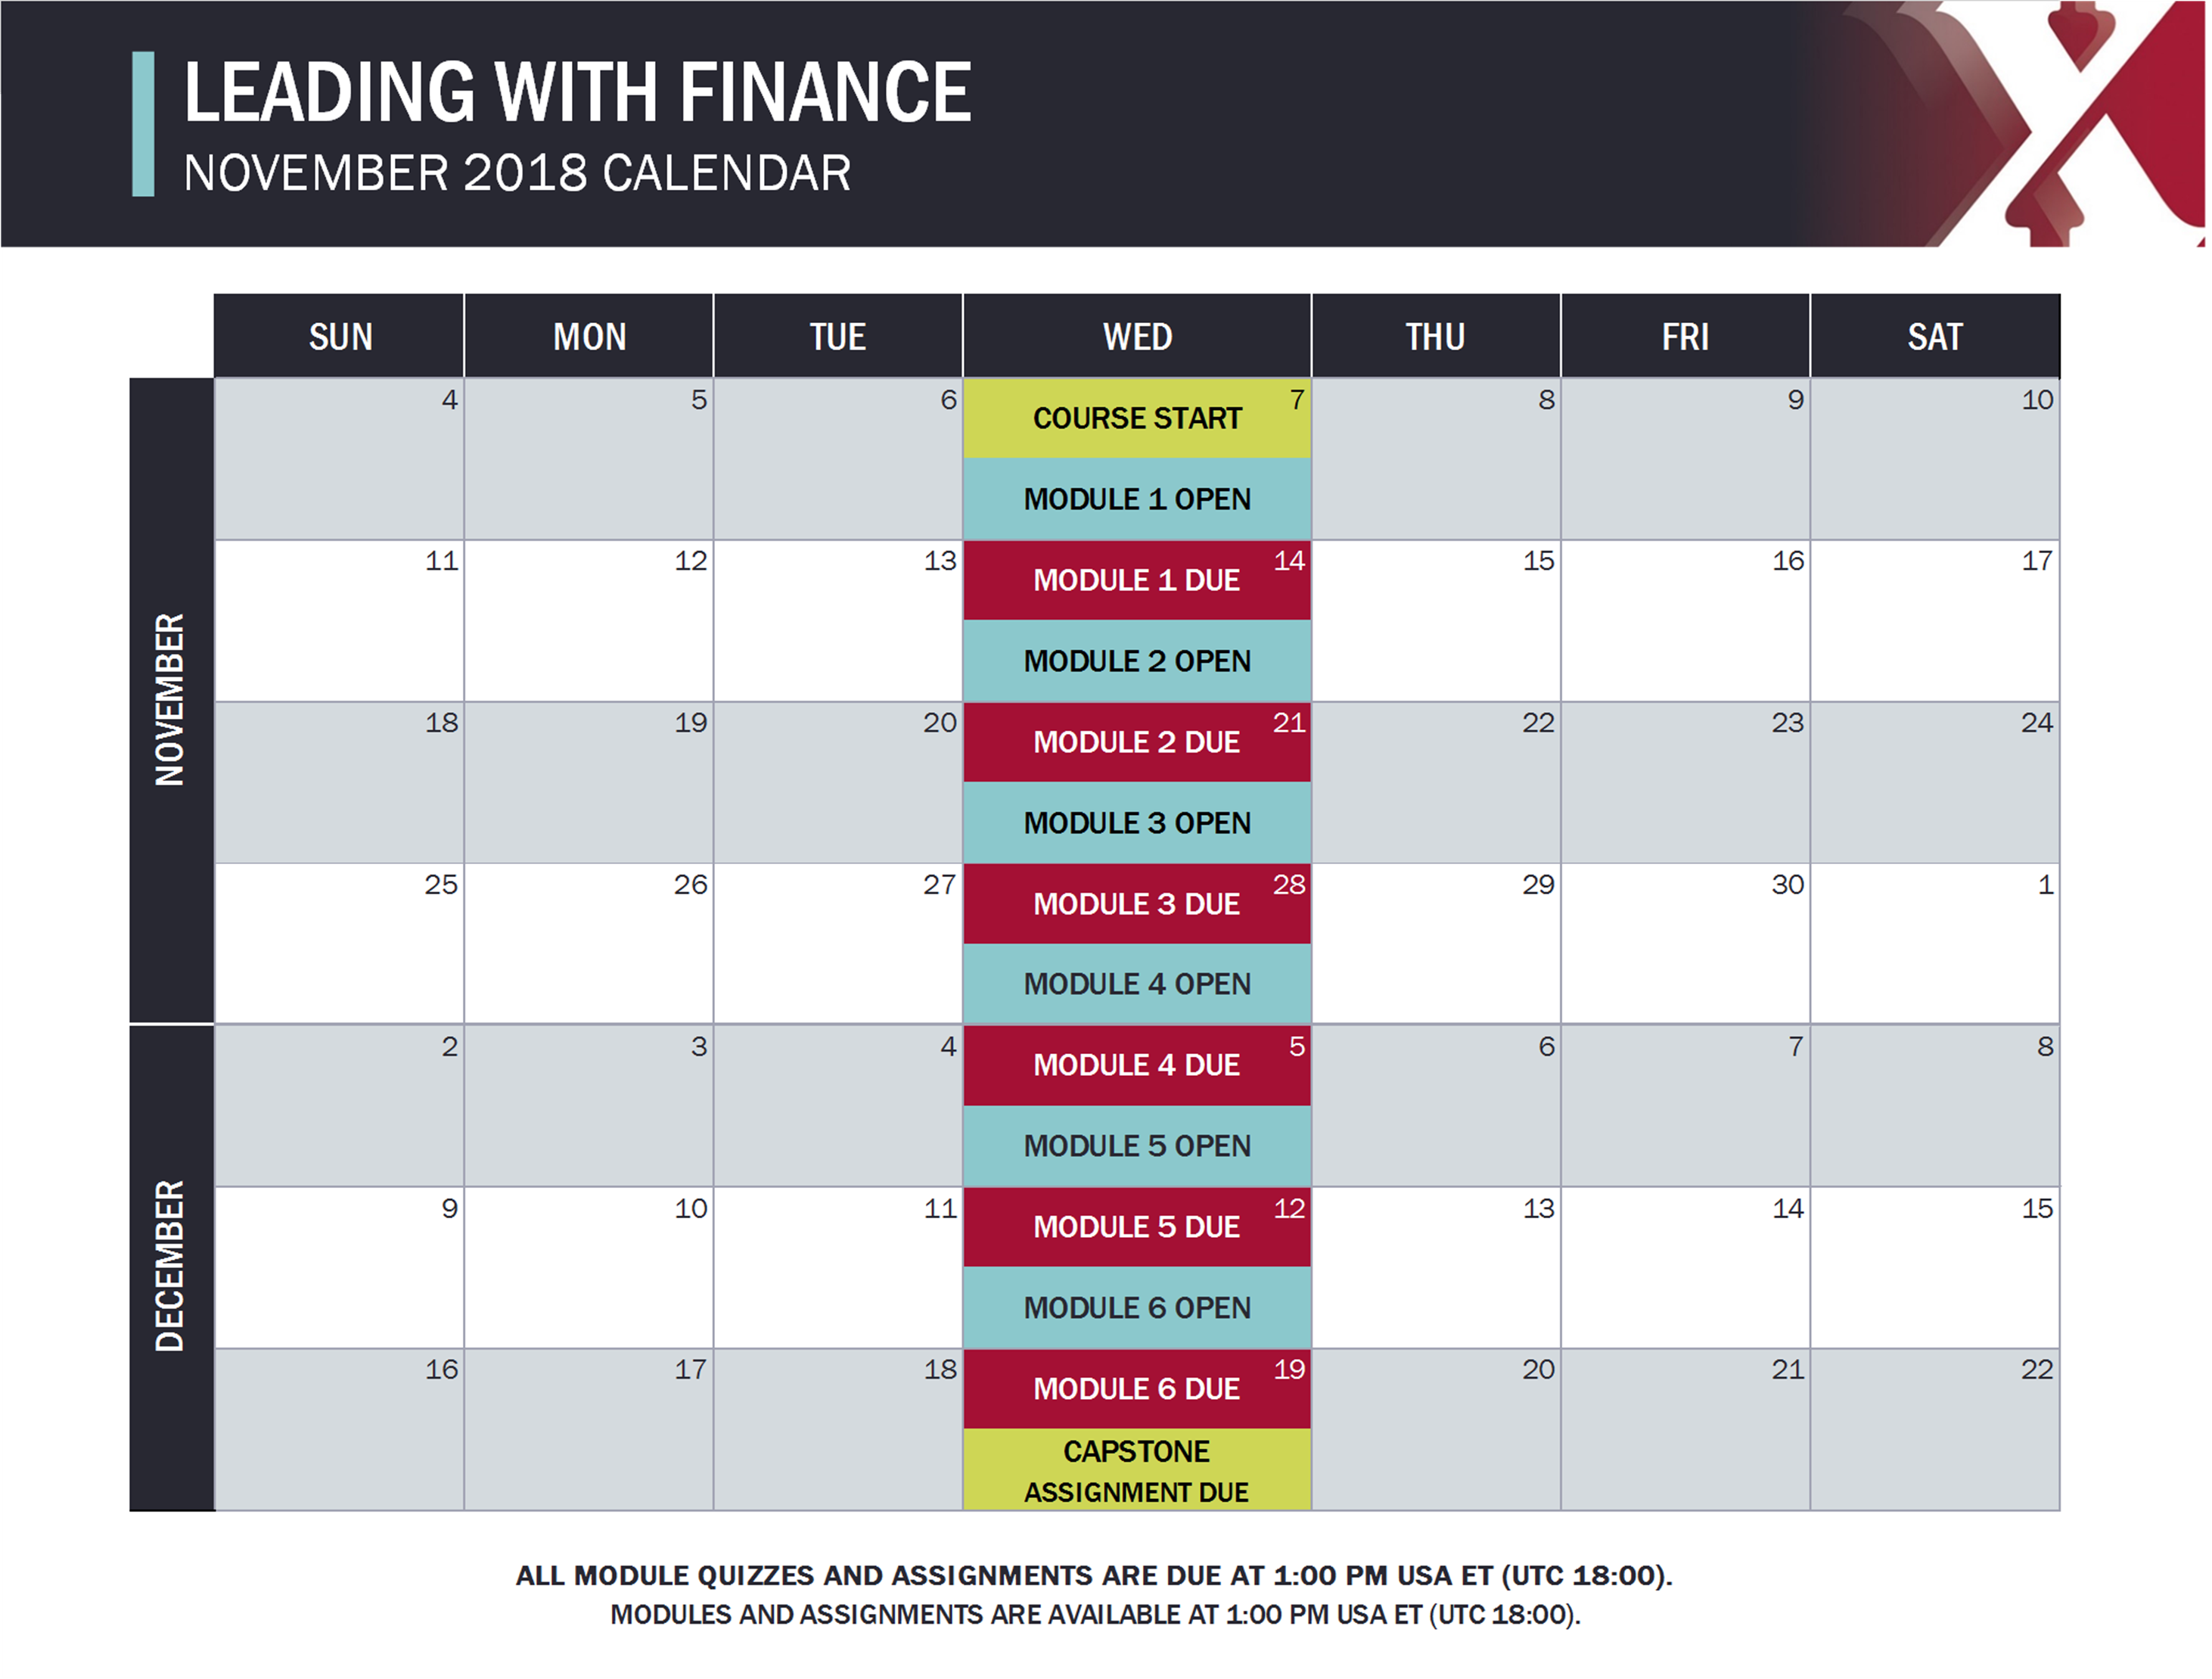 Online Course Finance Certificate Harvard Business School Hbx